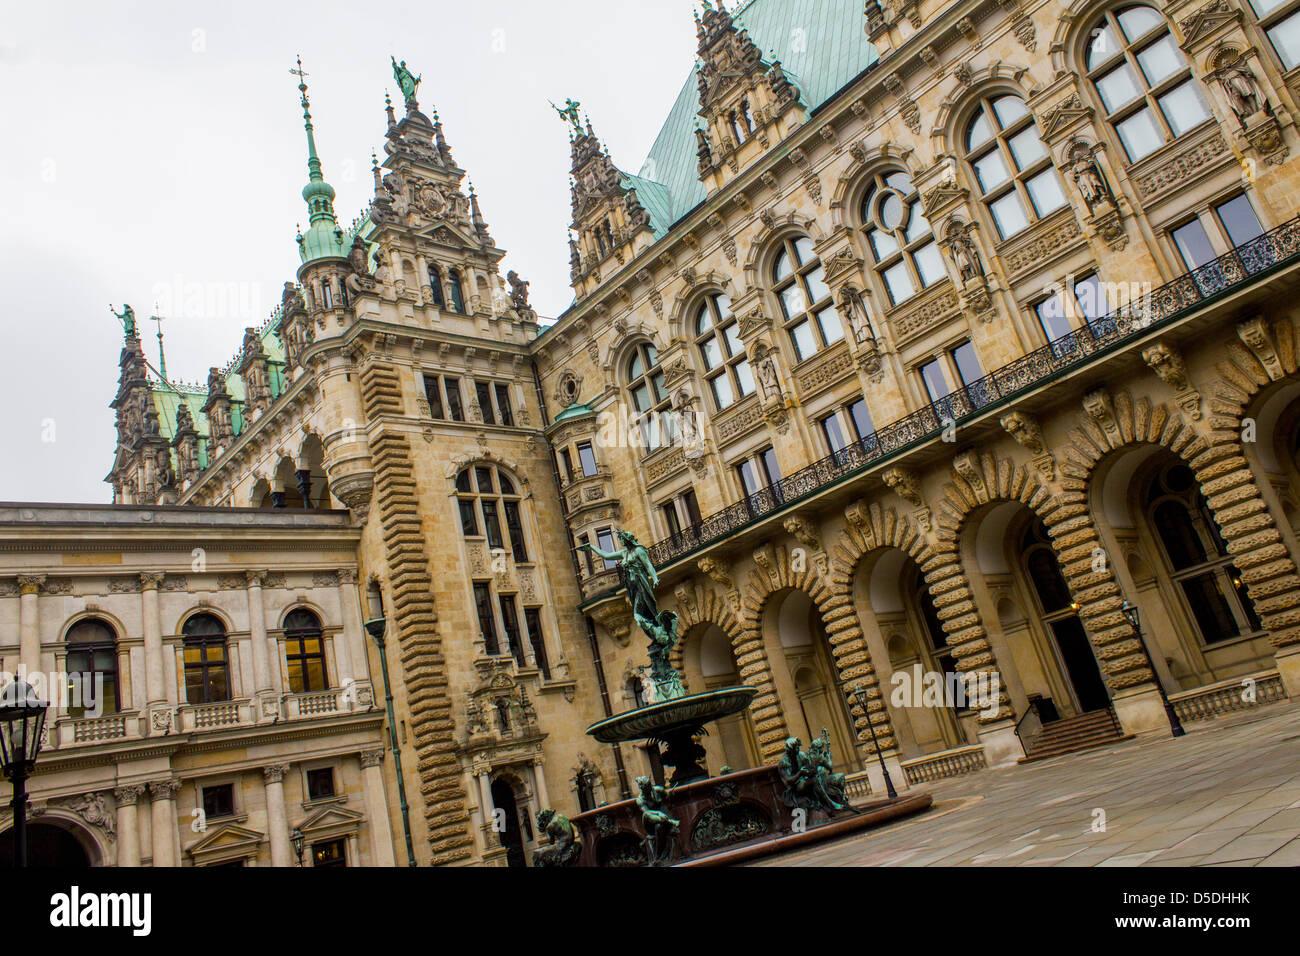 Hamburg Rathaus - Stock Image